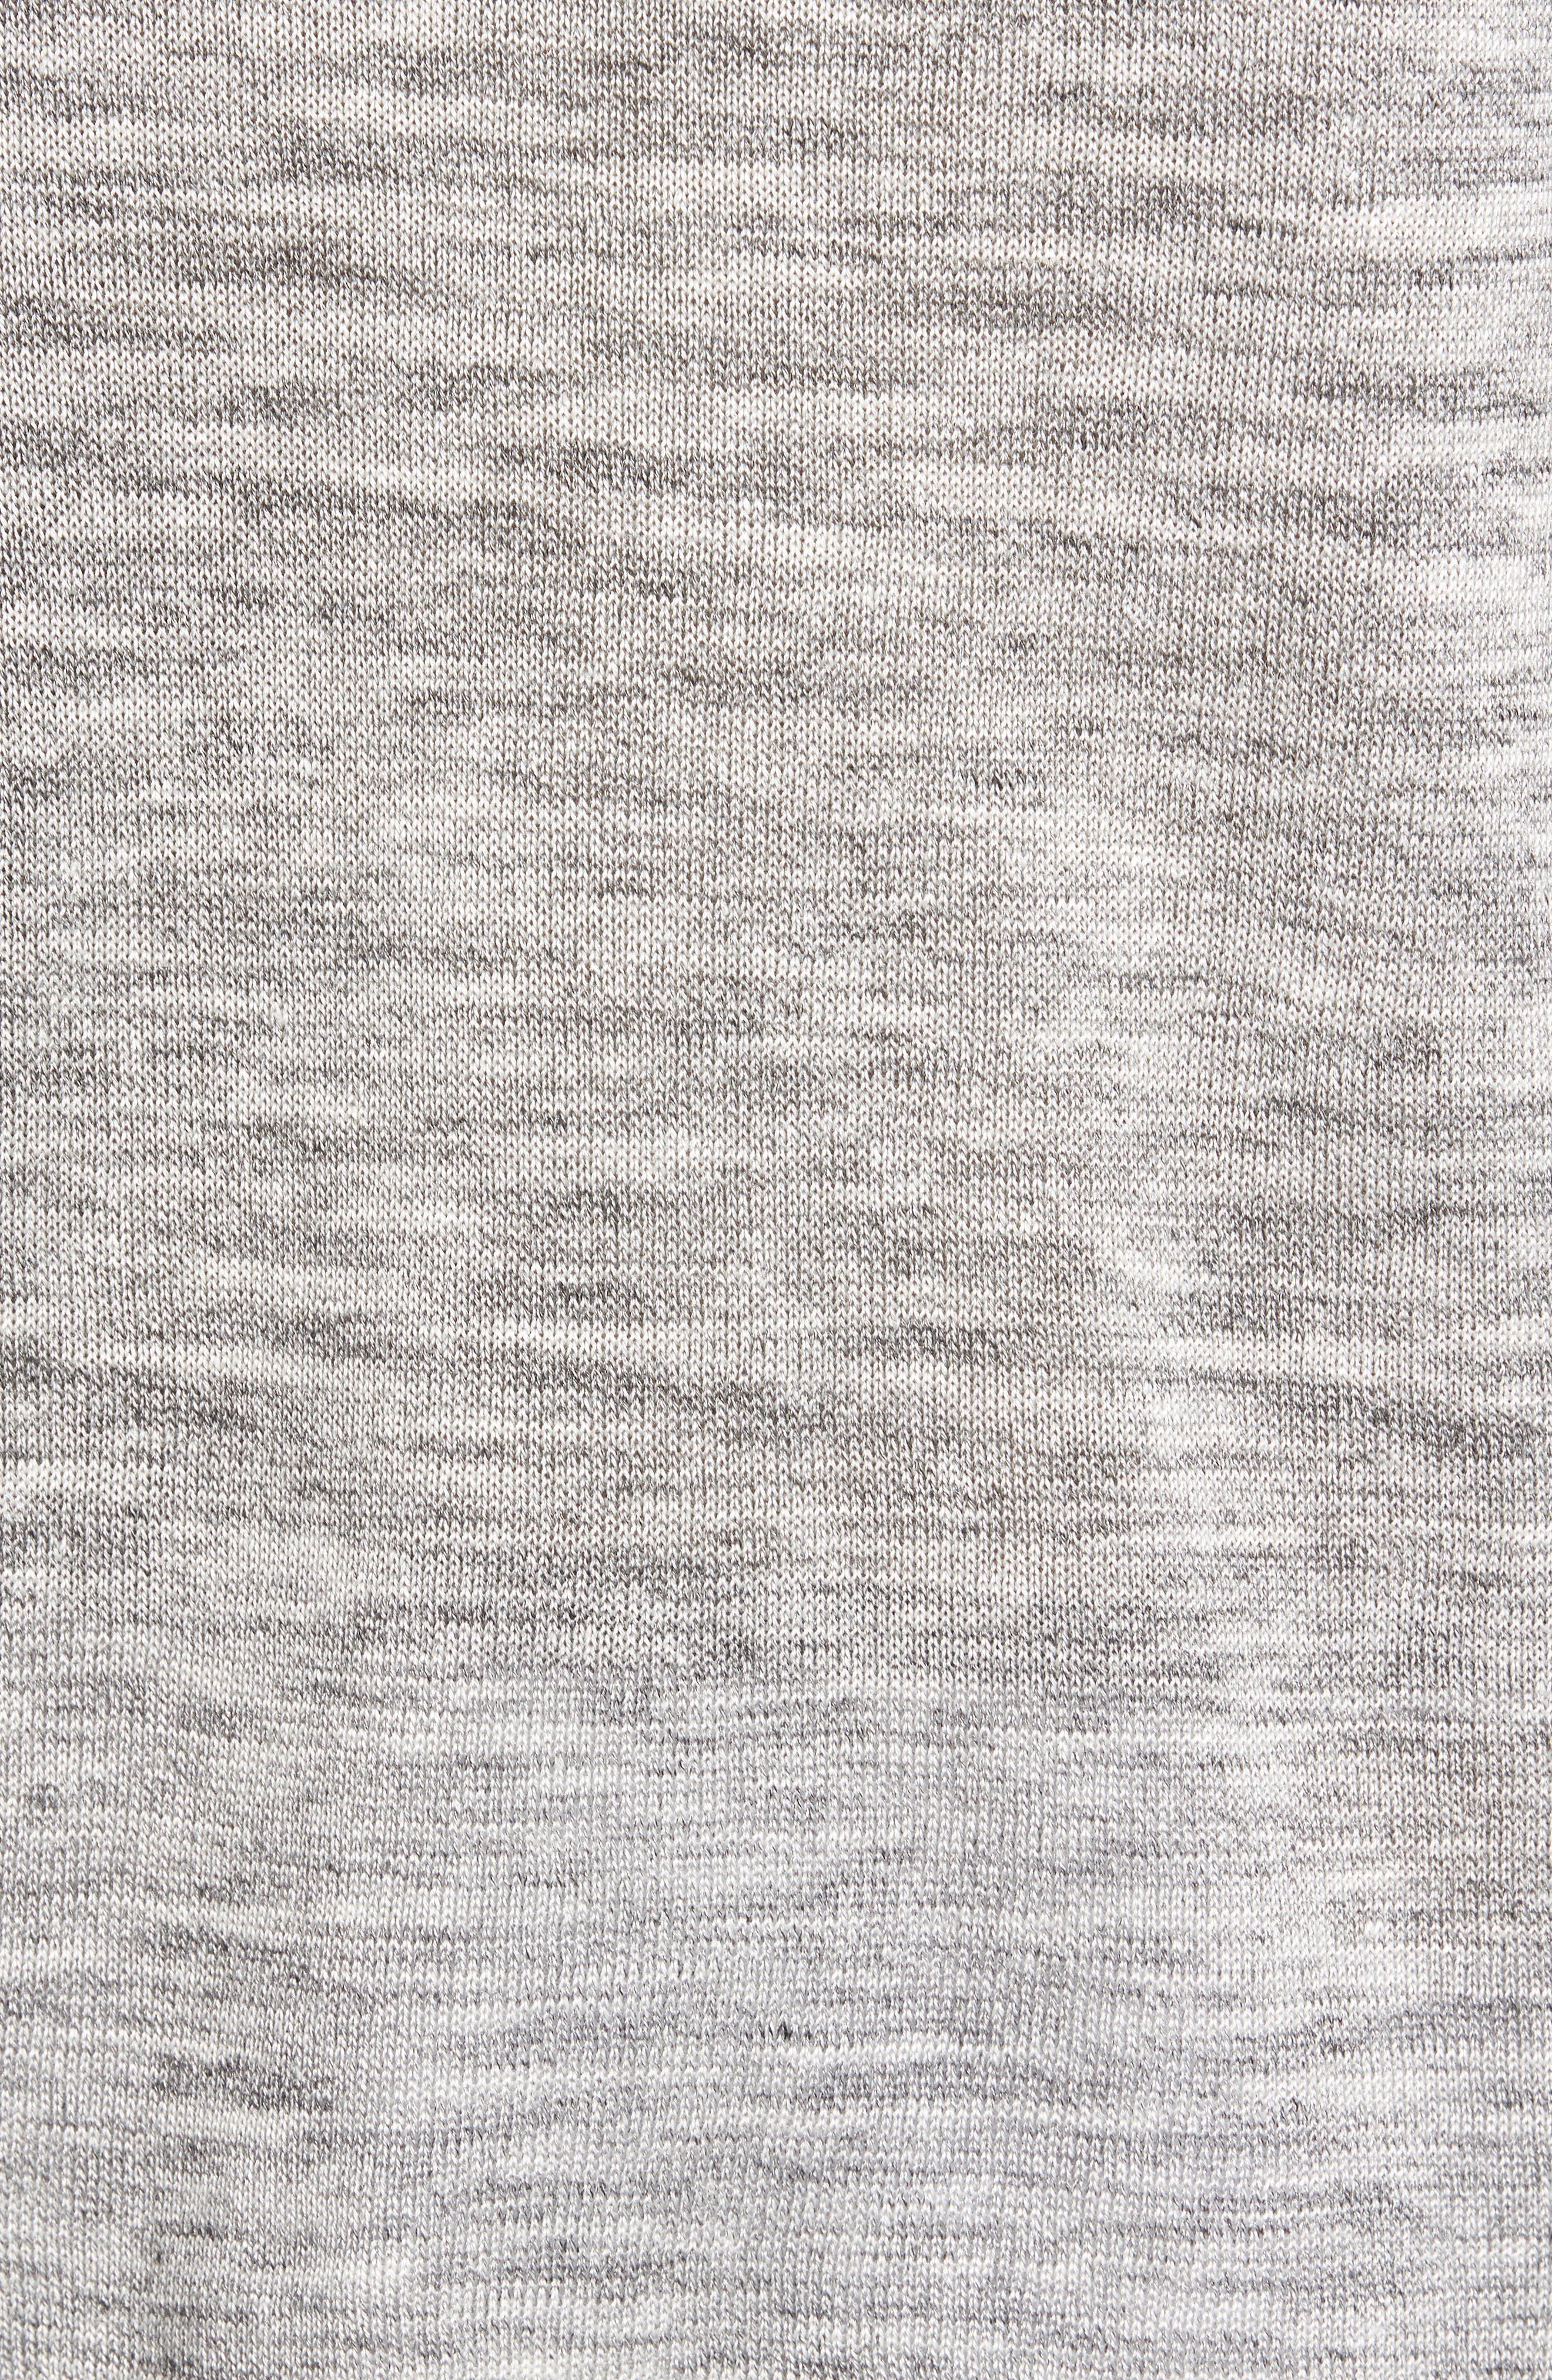 Inzone Crewneck Linen Blend Sweater,                             Alternate thumbnail 5, color,                             LIGHT GREY